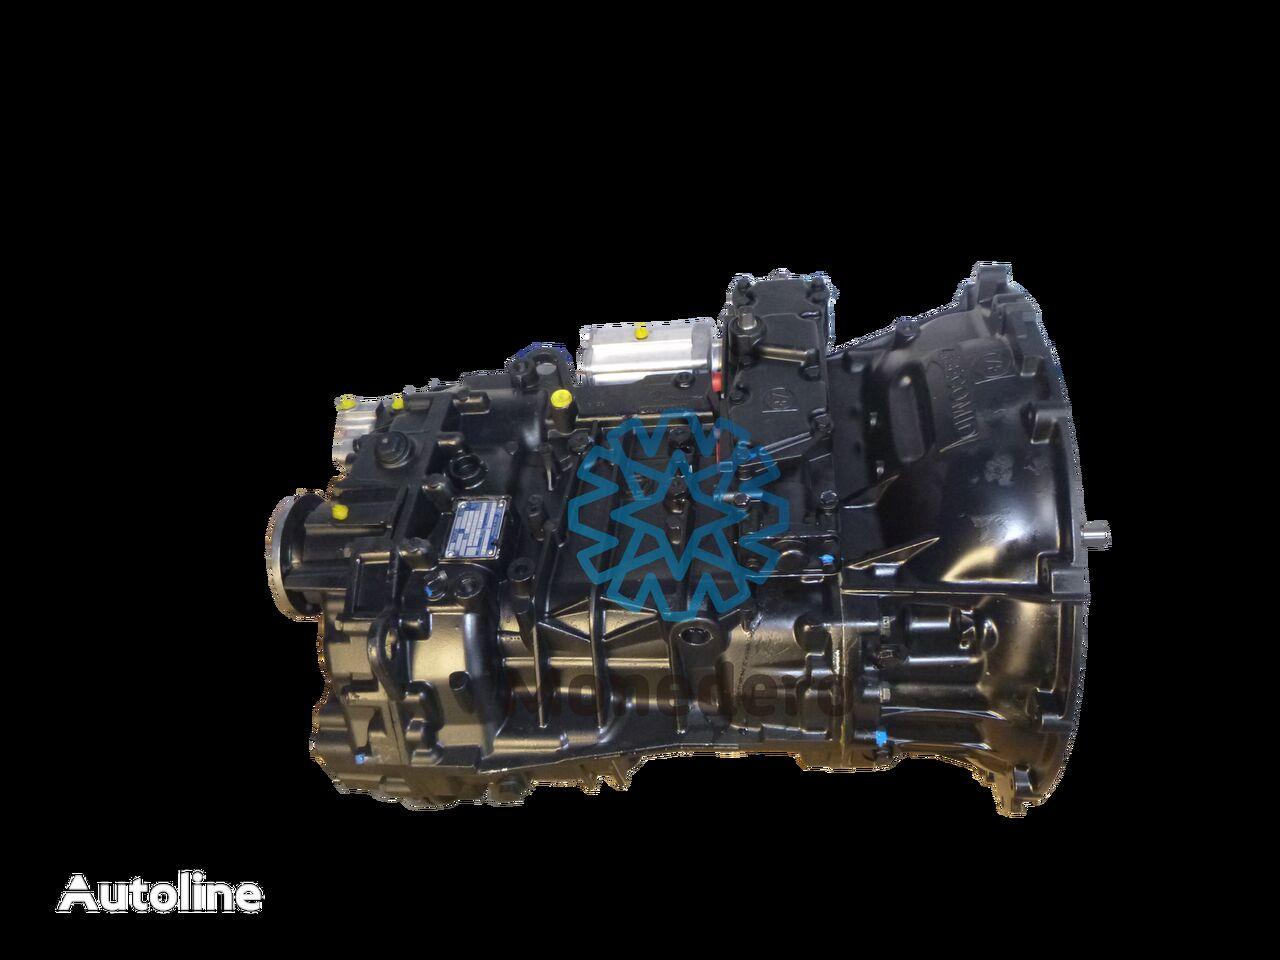 yeni 9S1110TO VOLVO DAF kamyon için ZF 9S1110TO vites kutusu